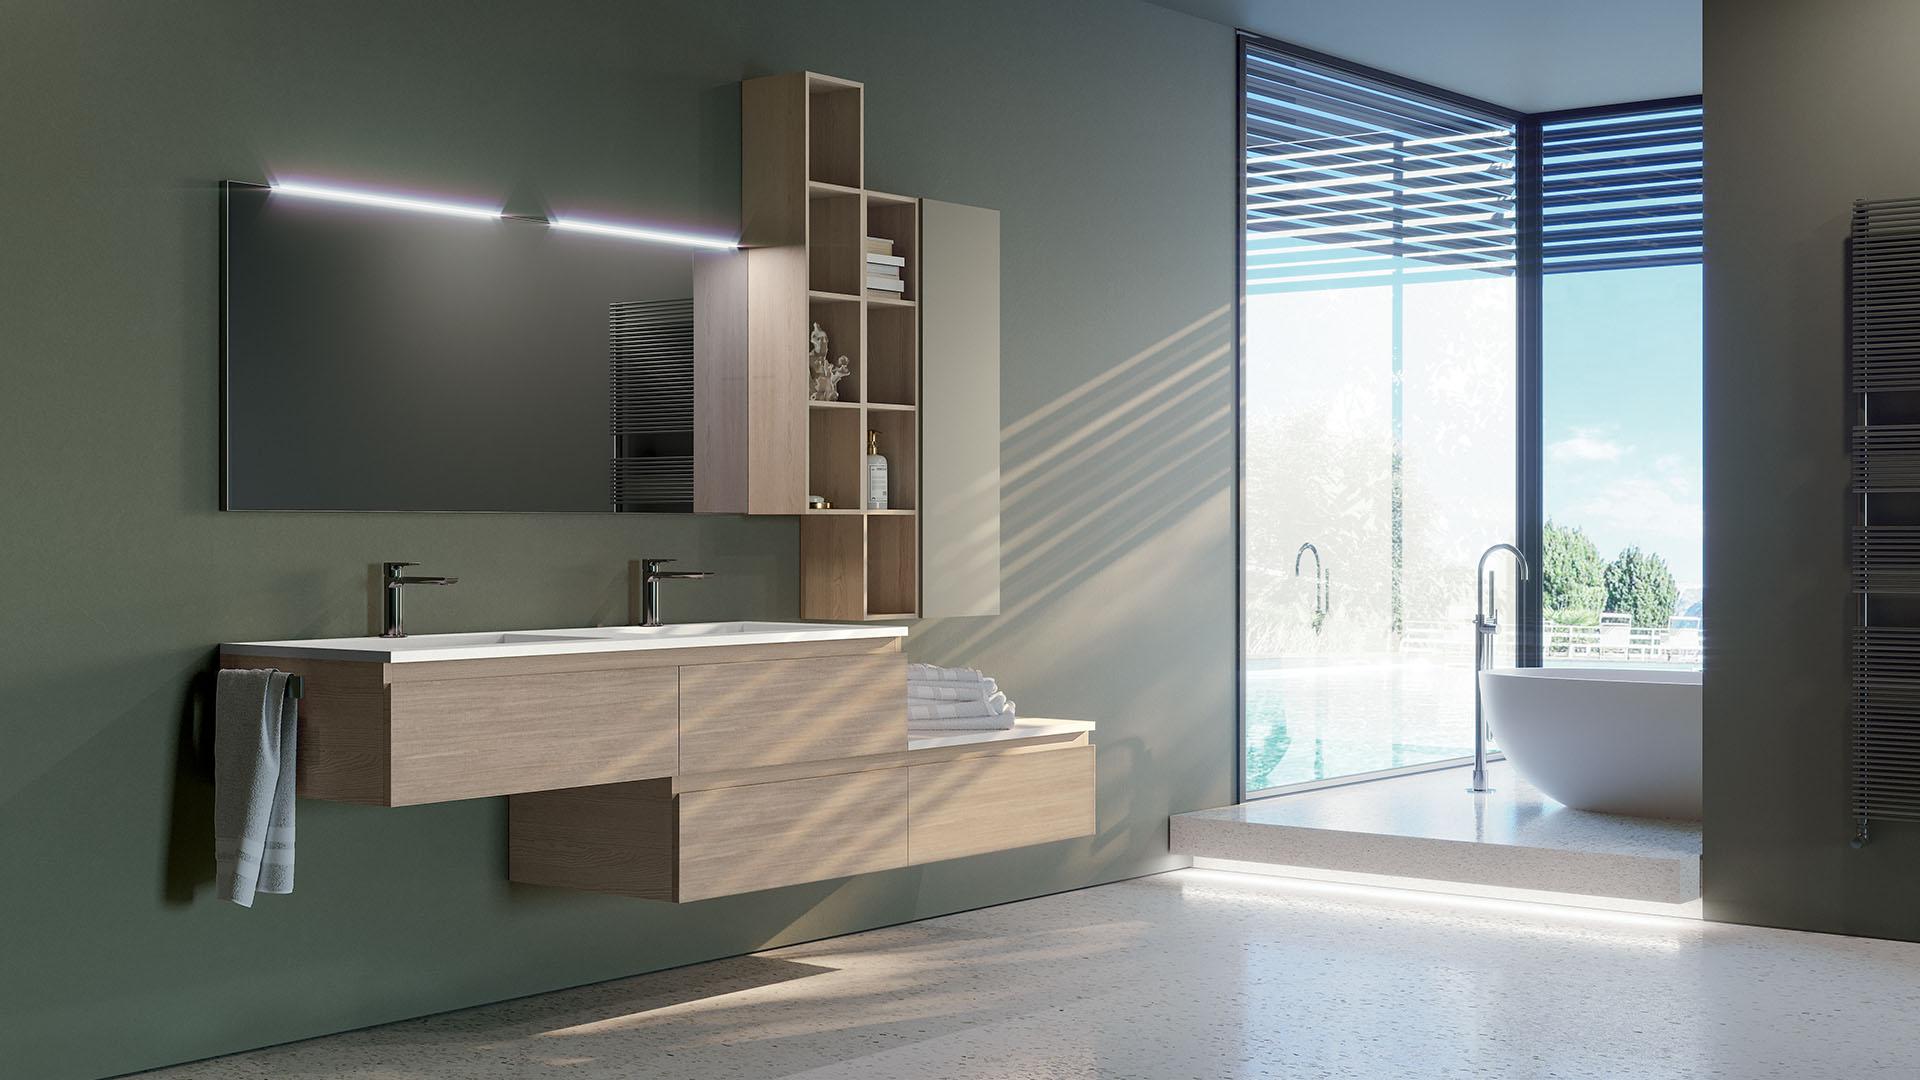 Bathroom Happy 15 - Licor Design